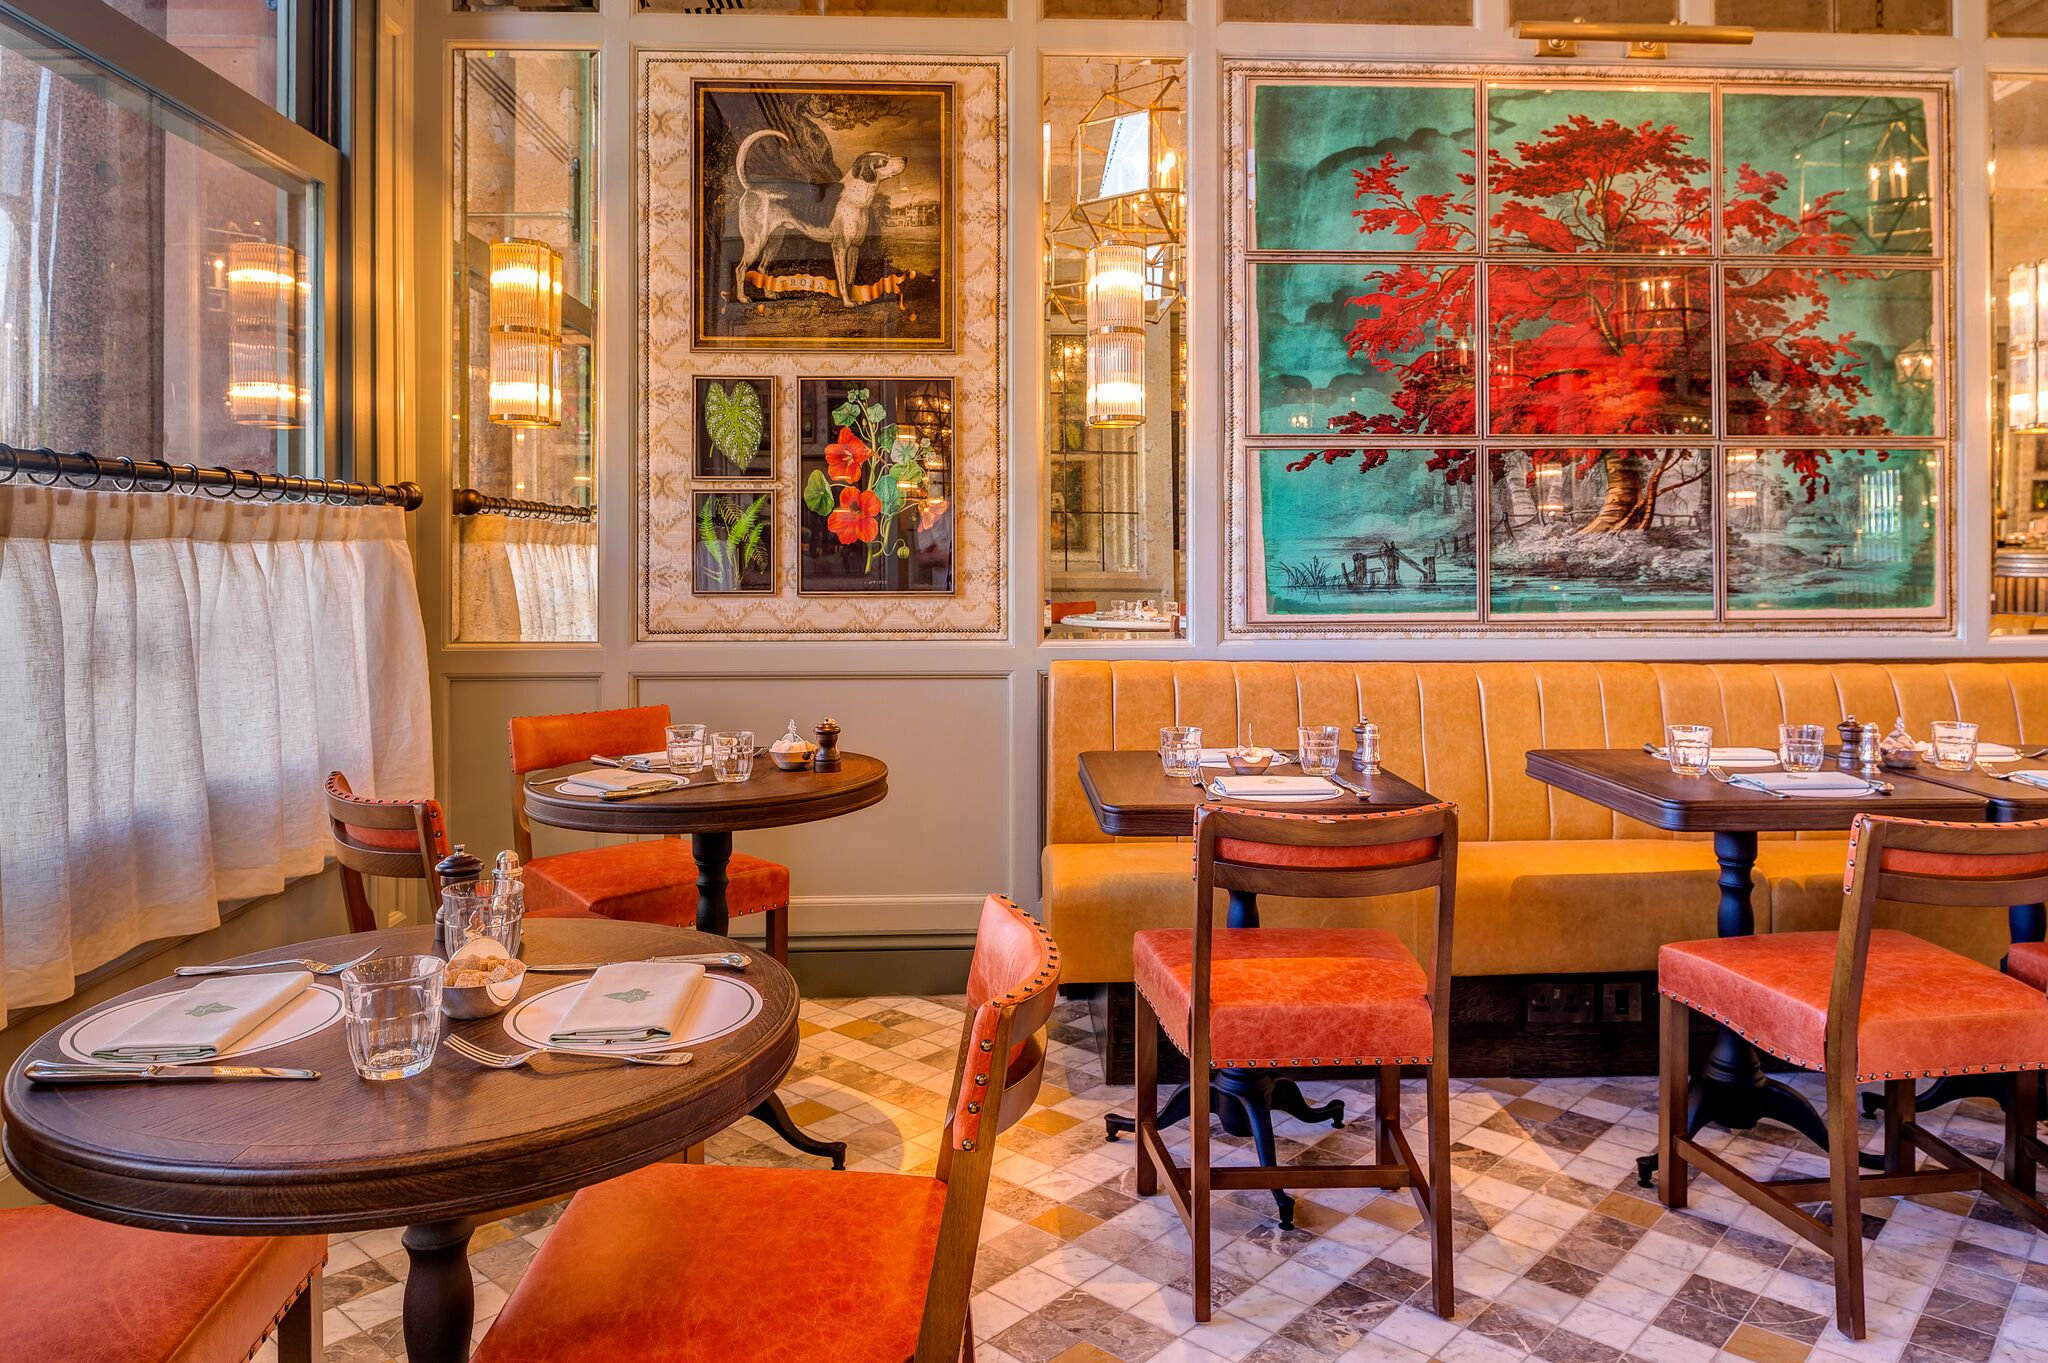 The Ivy Café,Wimbledon